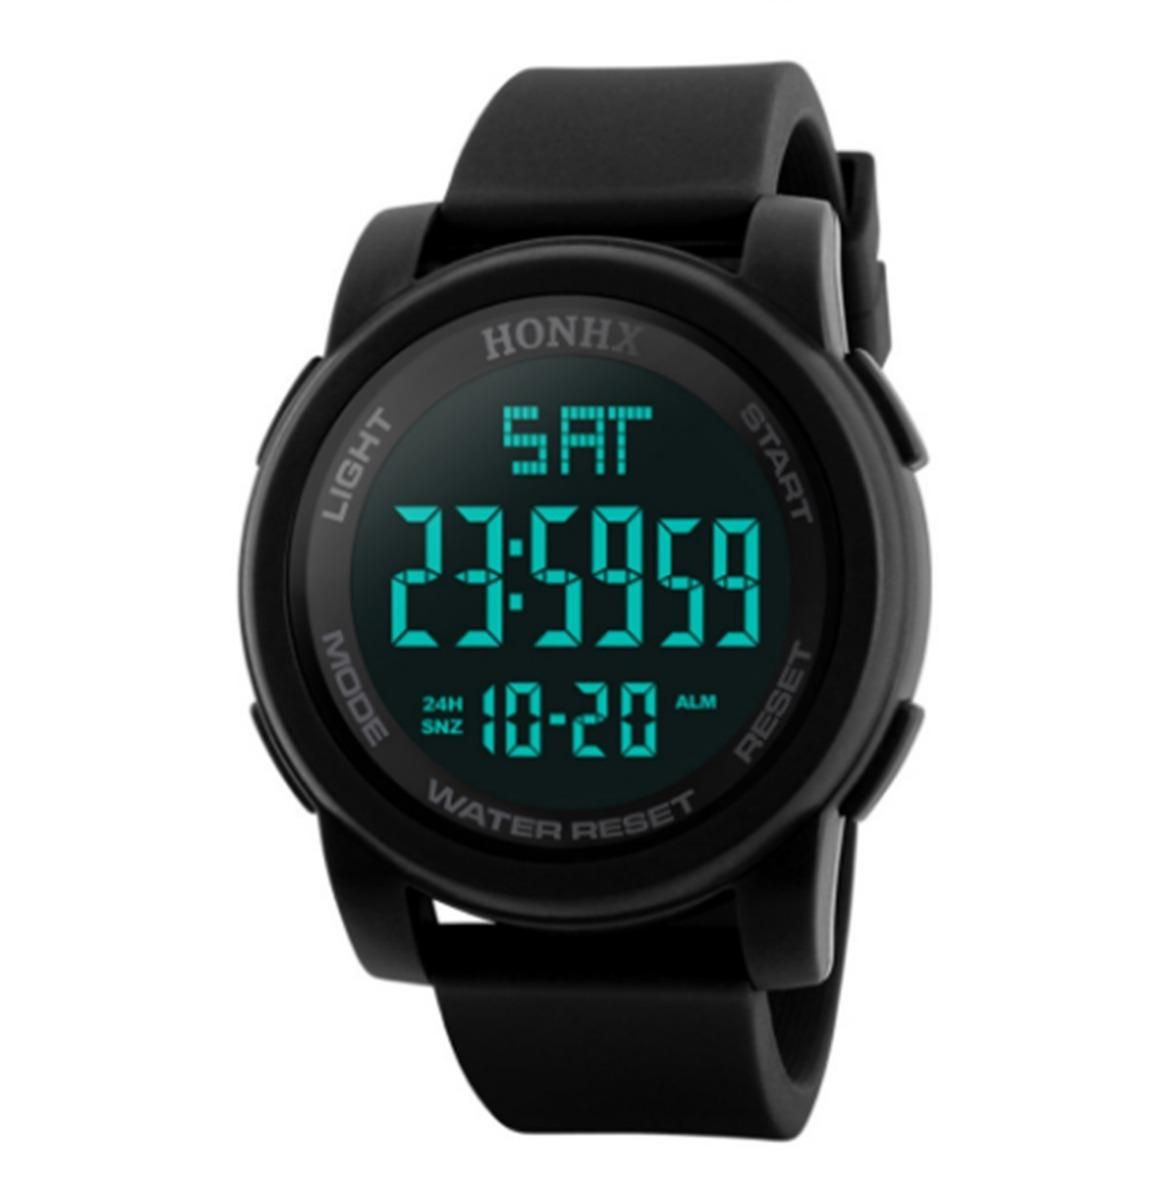 80e3c0b4446 relógio de pulso digital esportivo masculino led cronômetro. Carregando  zoom.